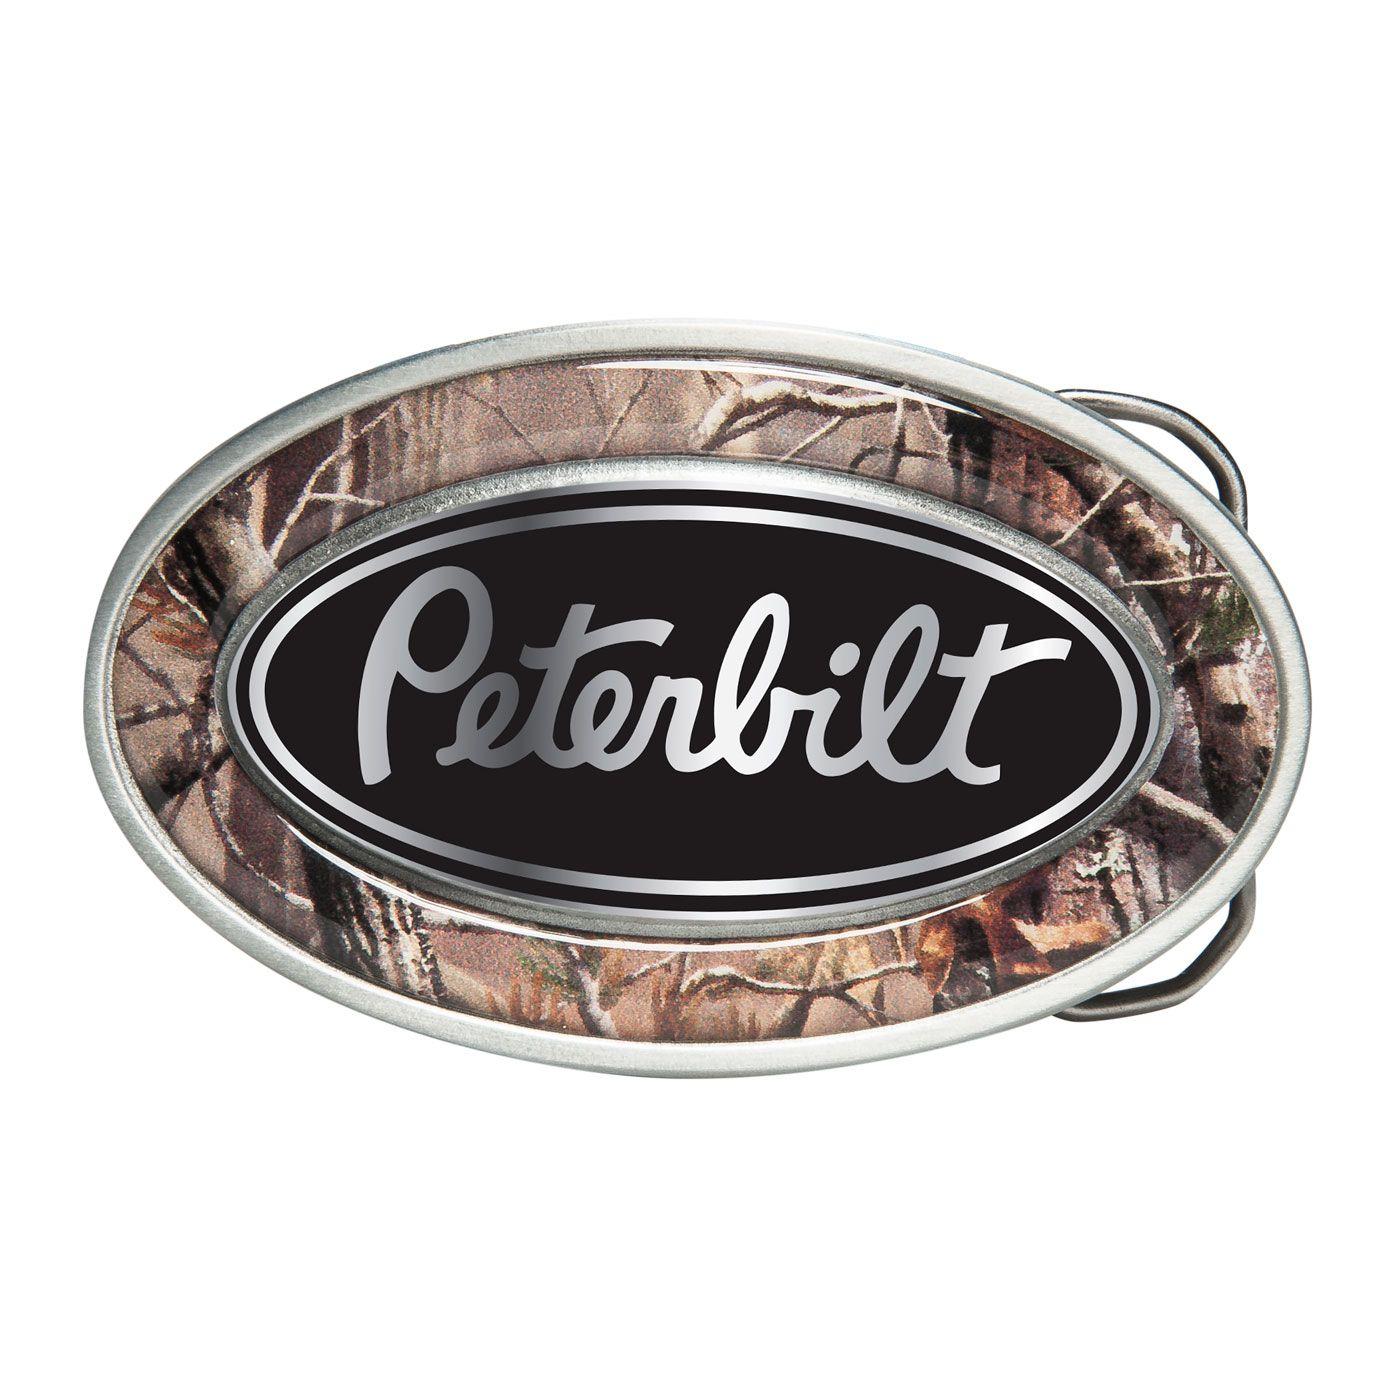 FORD TRUCKS logo metal BUCKLE Free Belt trucker truck driver gift idea